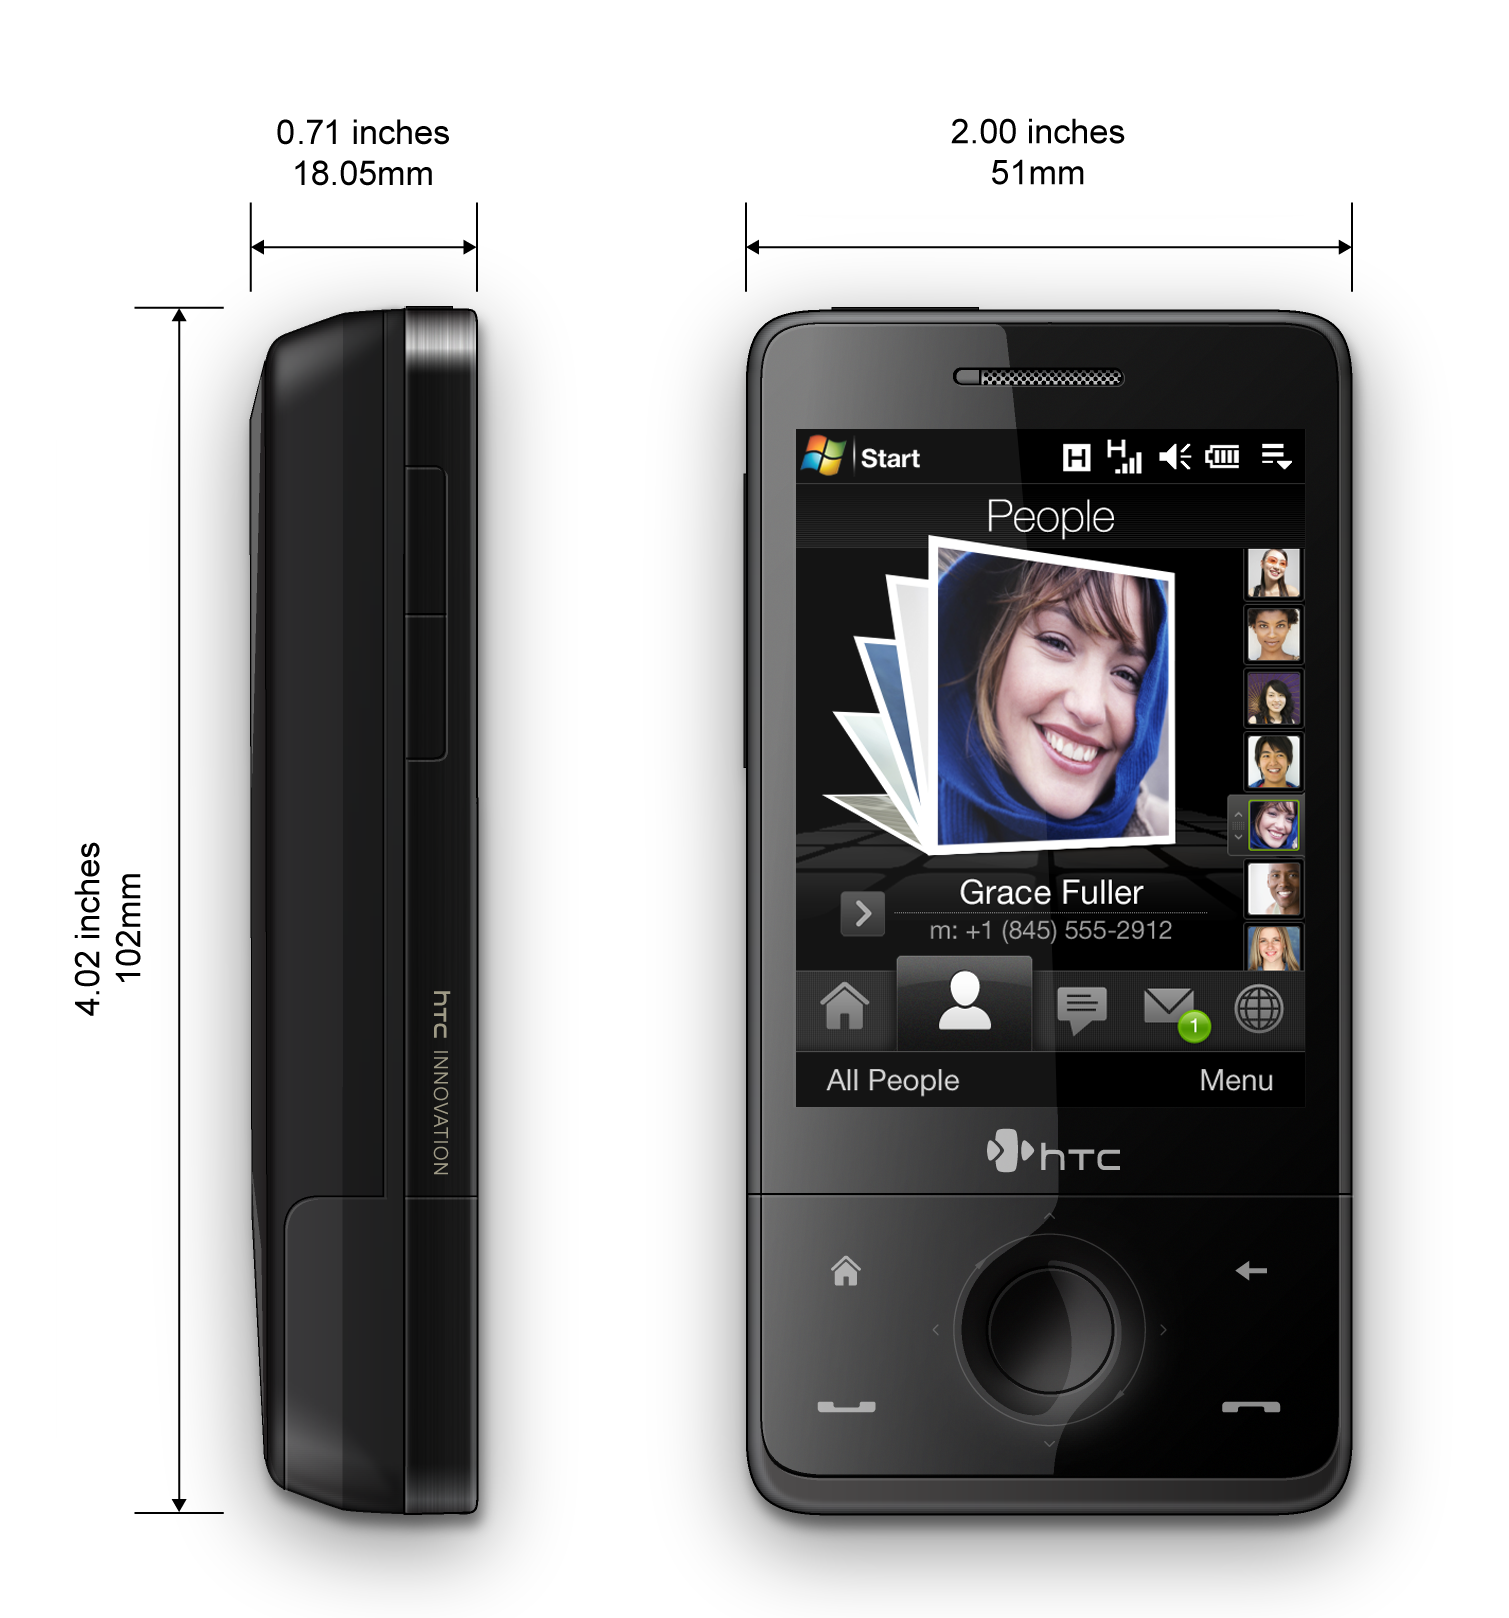 HTC Touch Pro T7272  HTC Raphael 100  Specs   Technical Datasheet